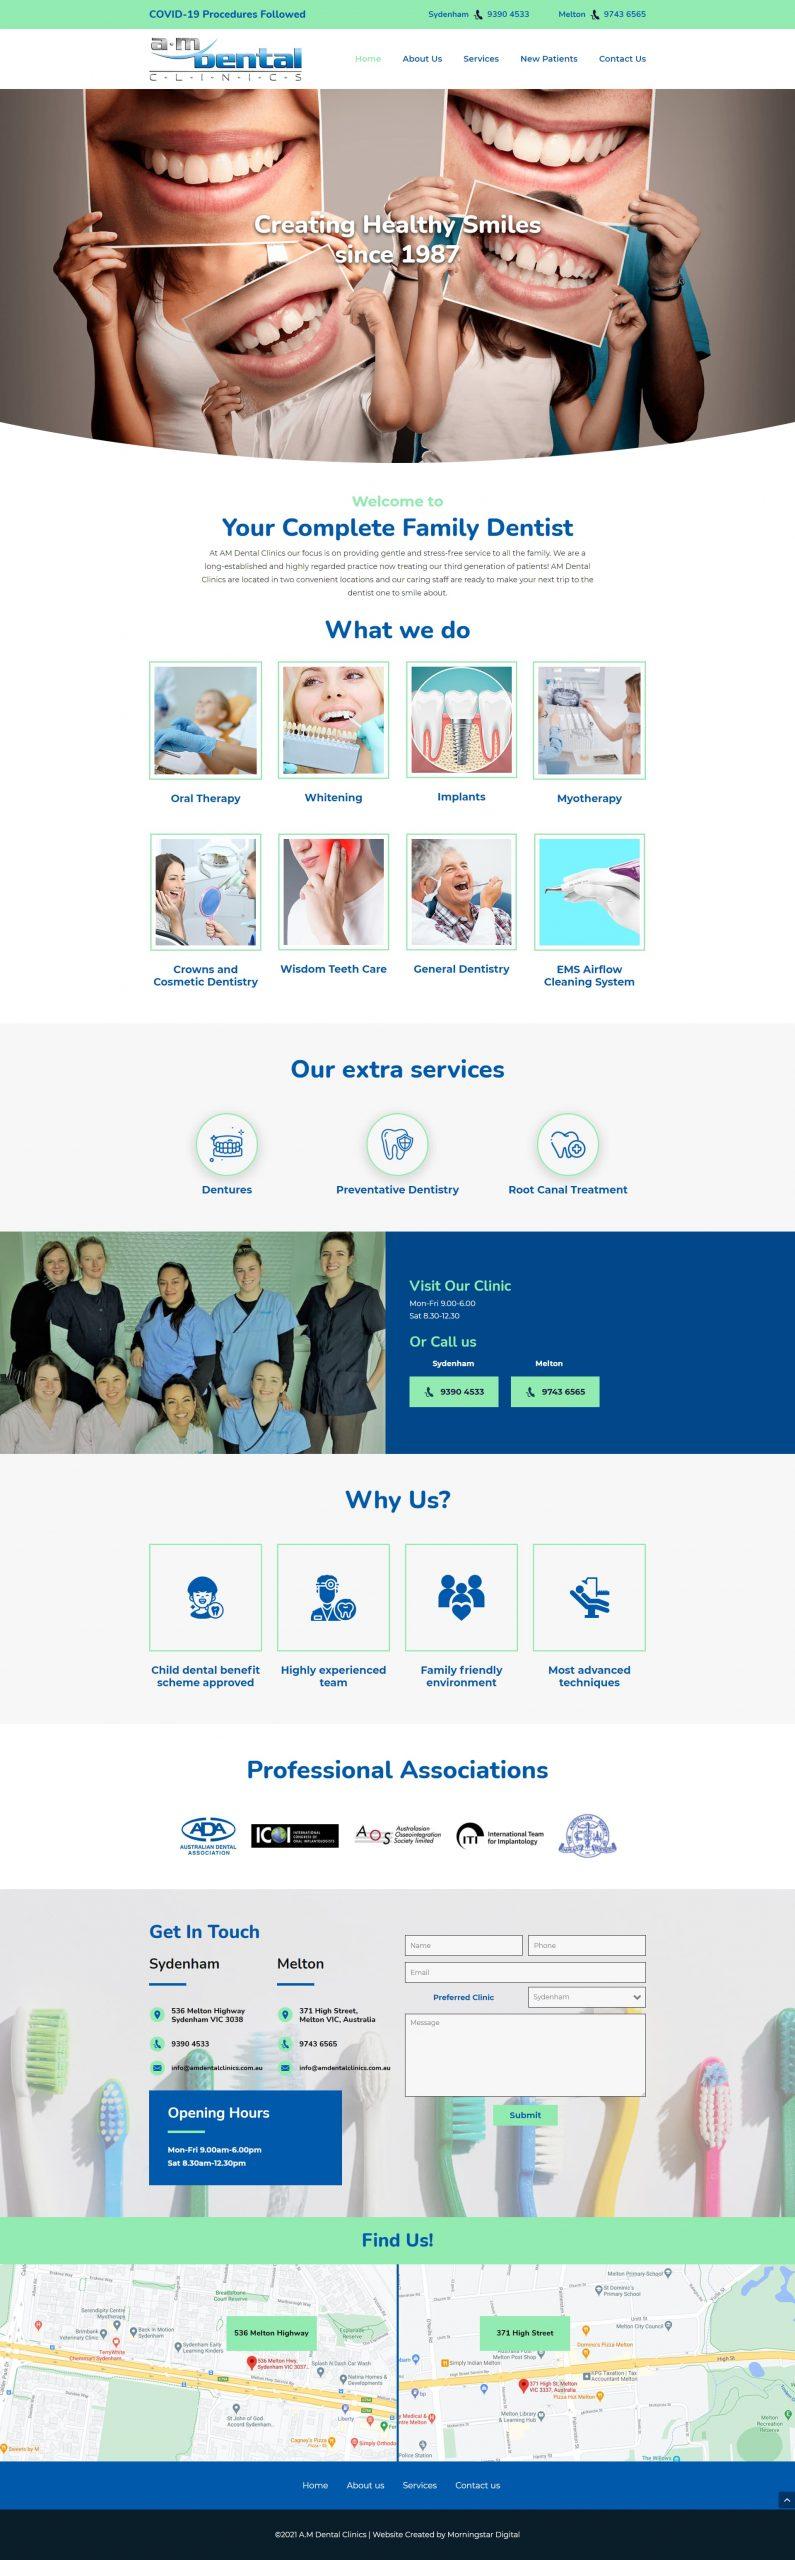 AMDental Homepage